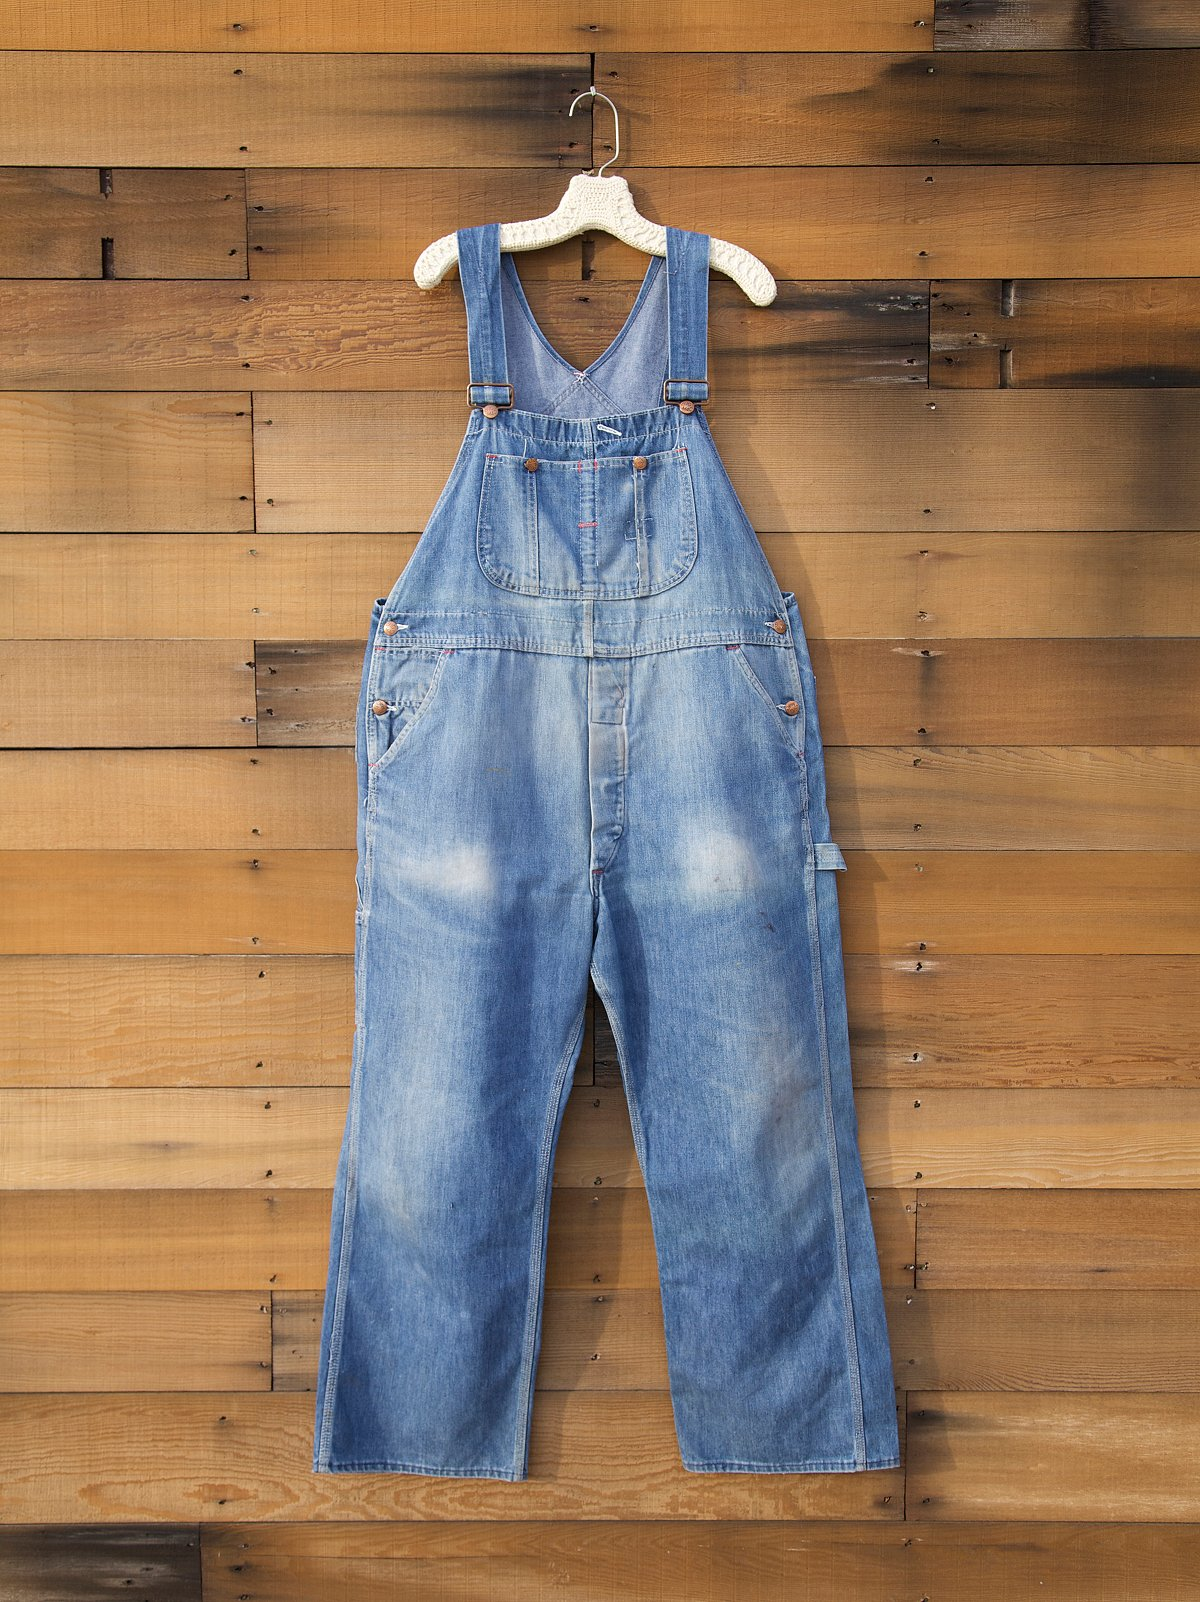 Vintage Denim Overalls